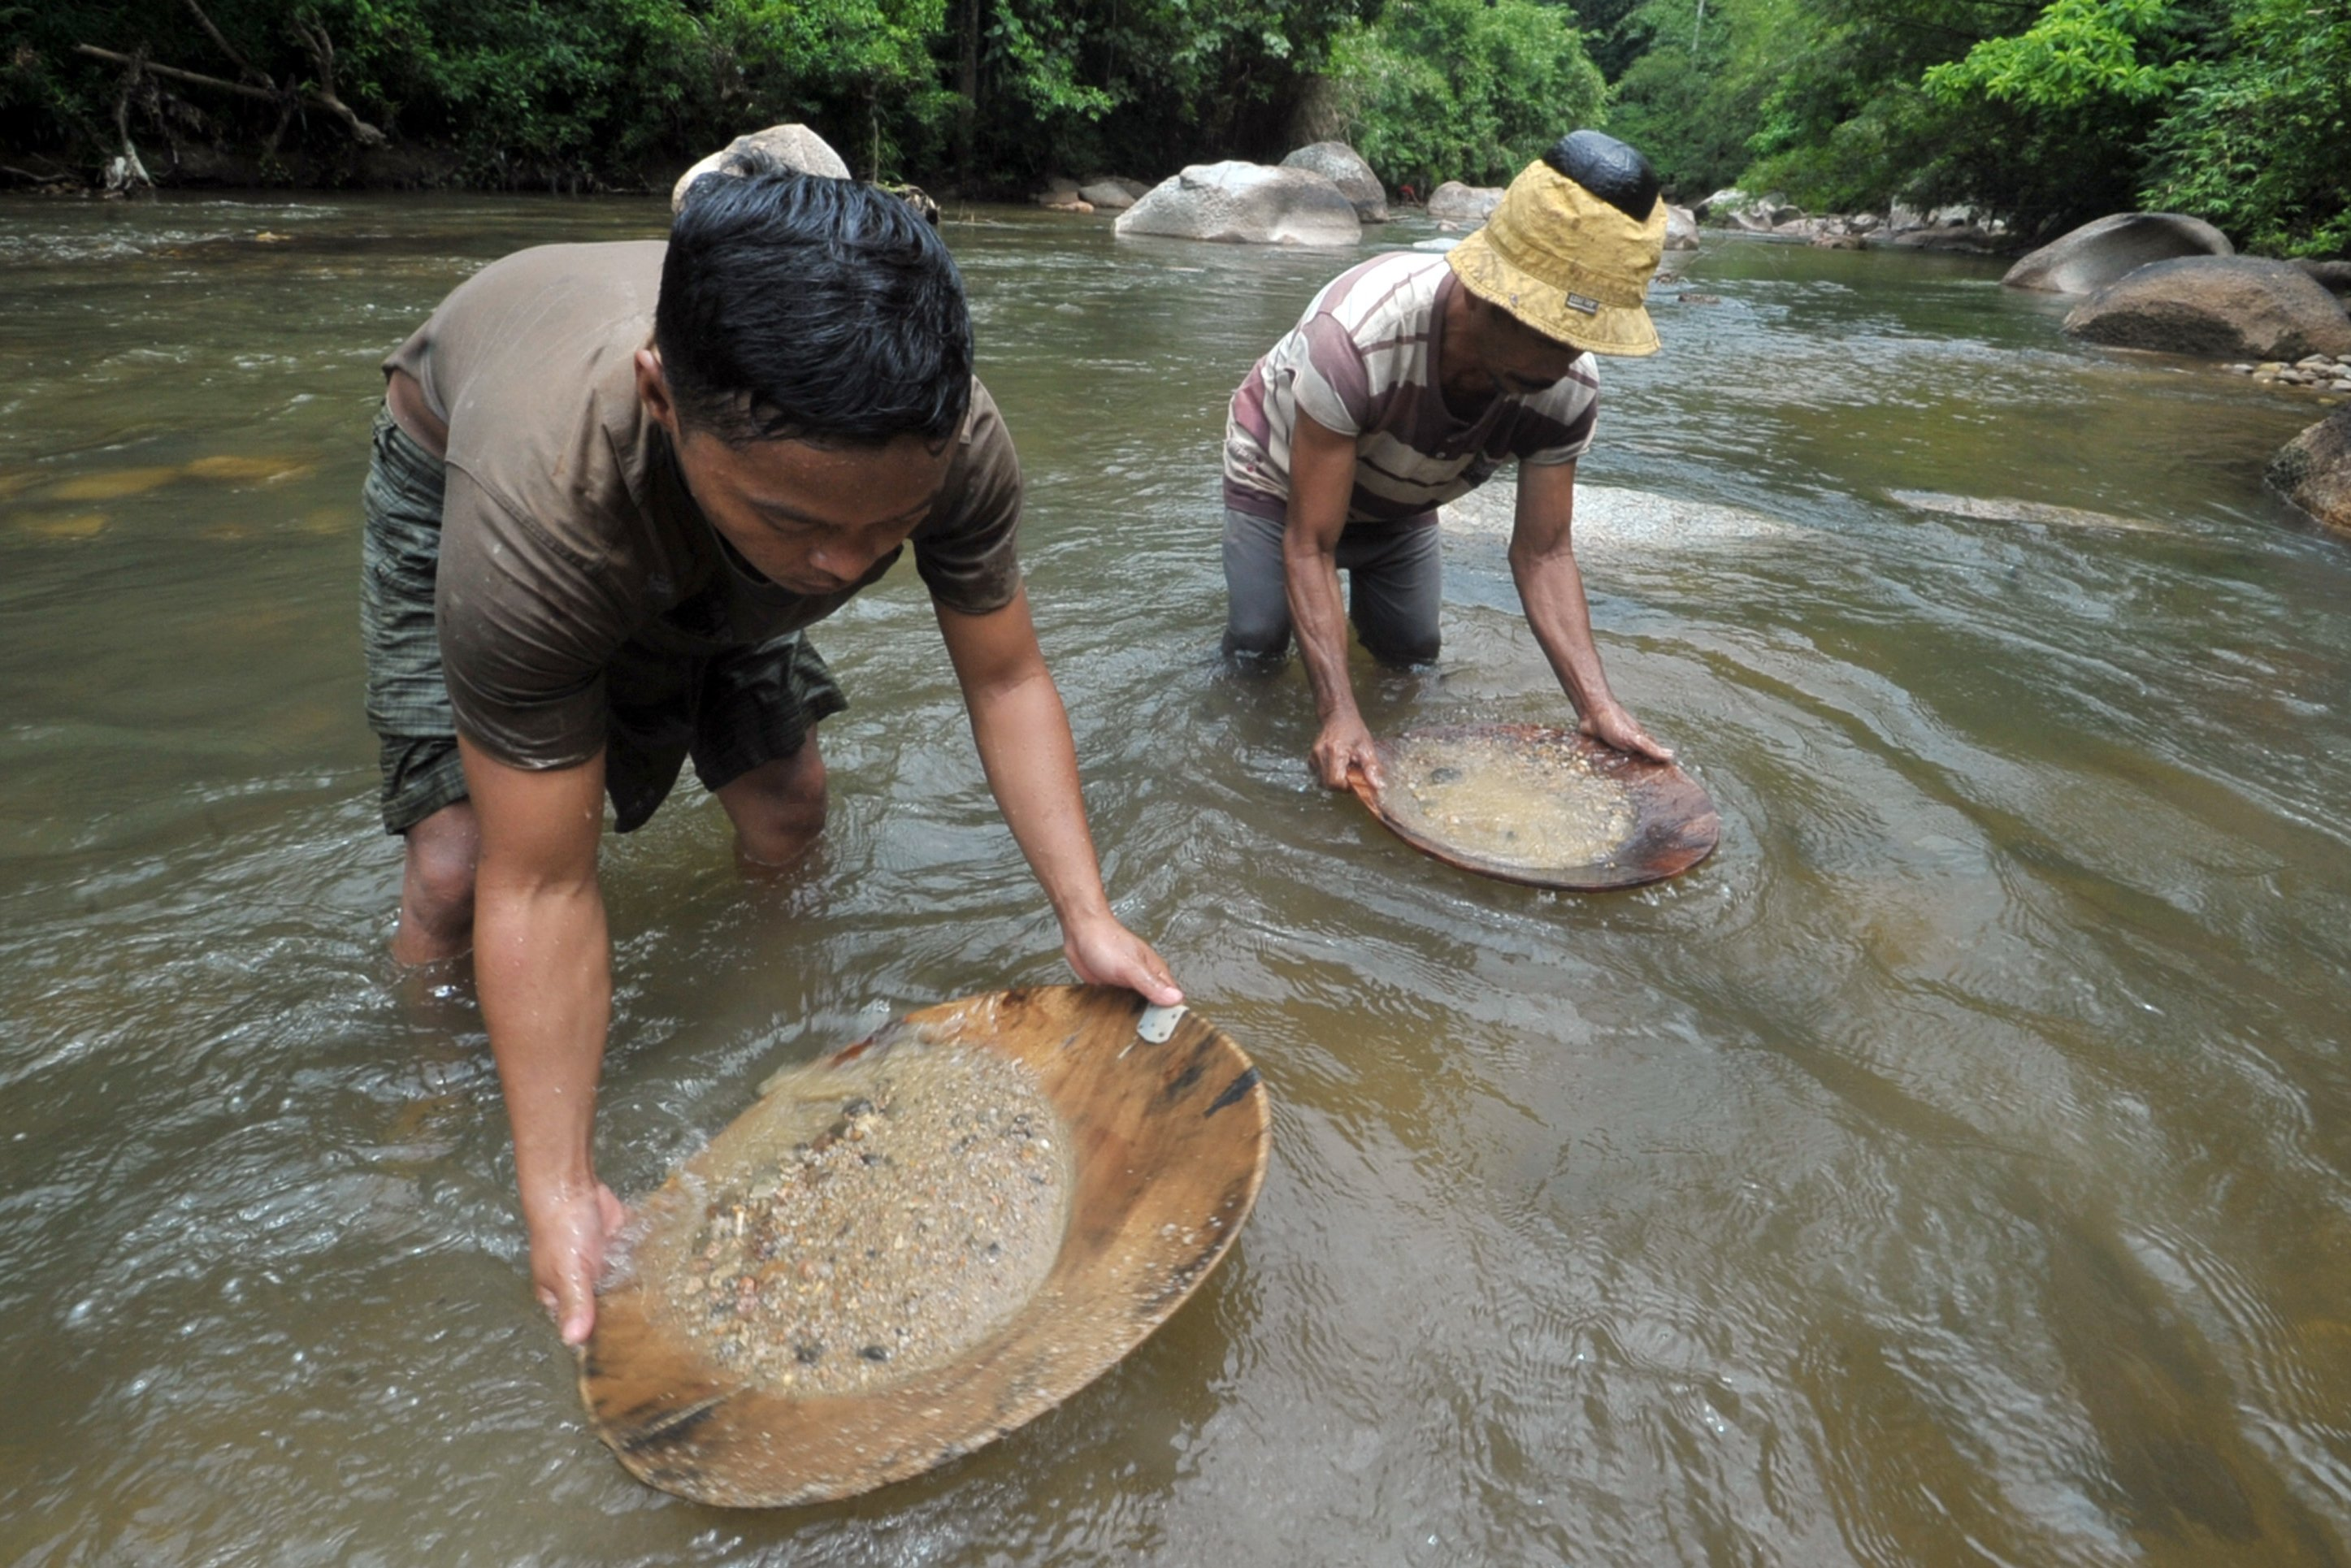 Mereka mencari emas secara tradisional dengan mendulang. Alat dulang yang mereka gunakan terbuat dari kayu berbentuk bulat dan biasanya disebut \